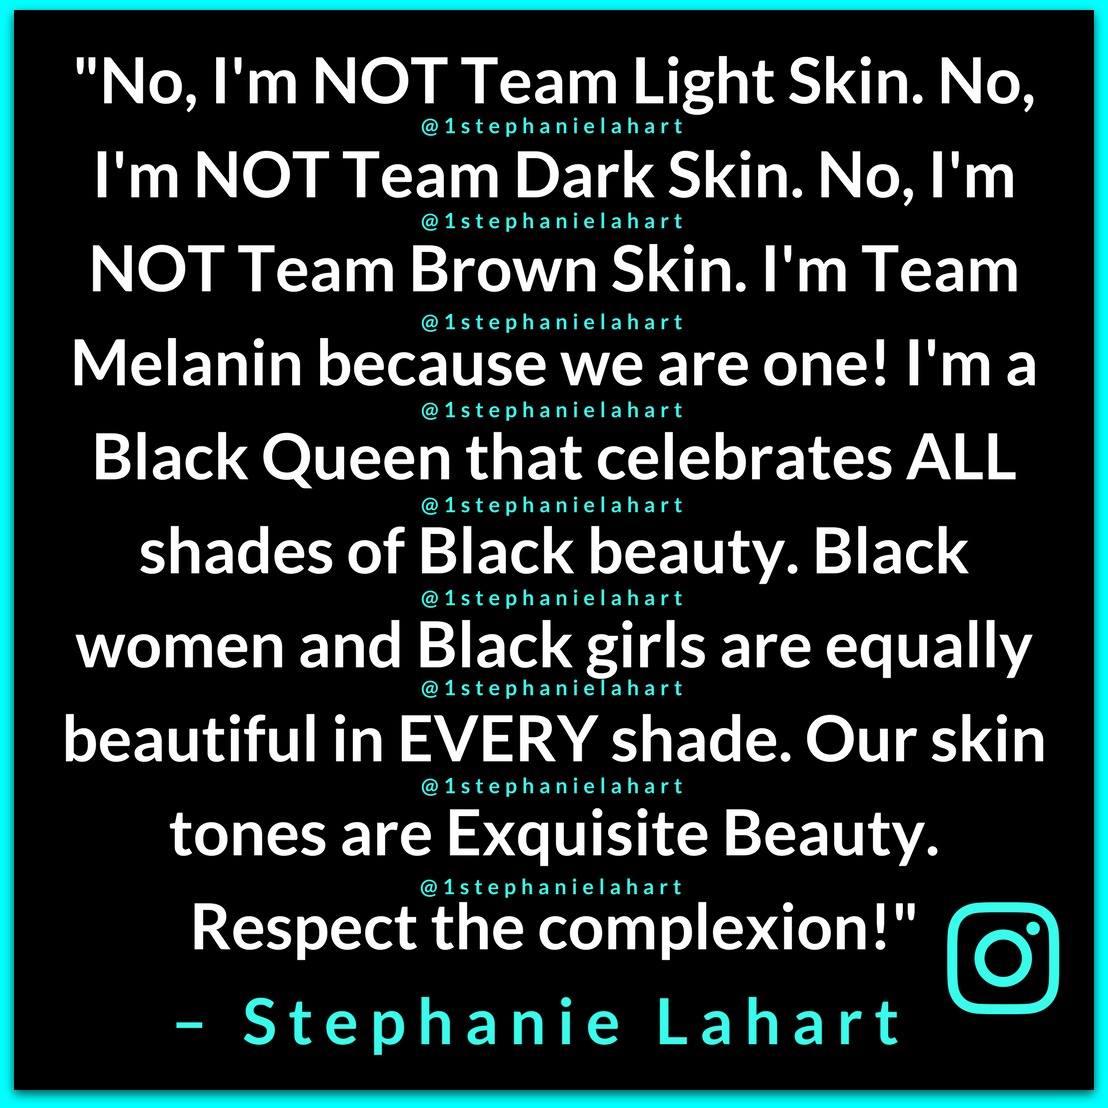 Stephanie Lahart On Twitter Inspirational And Empowering Melanin